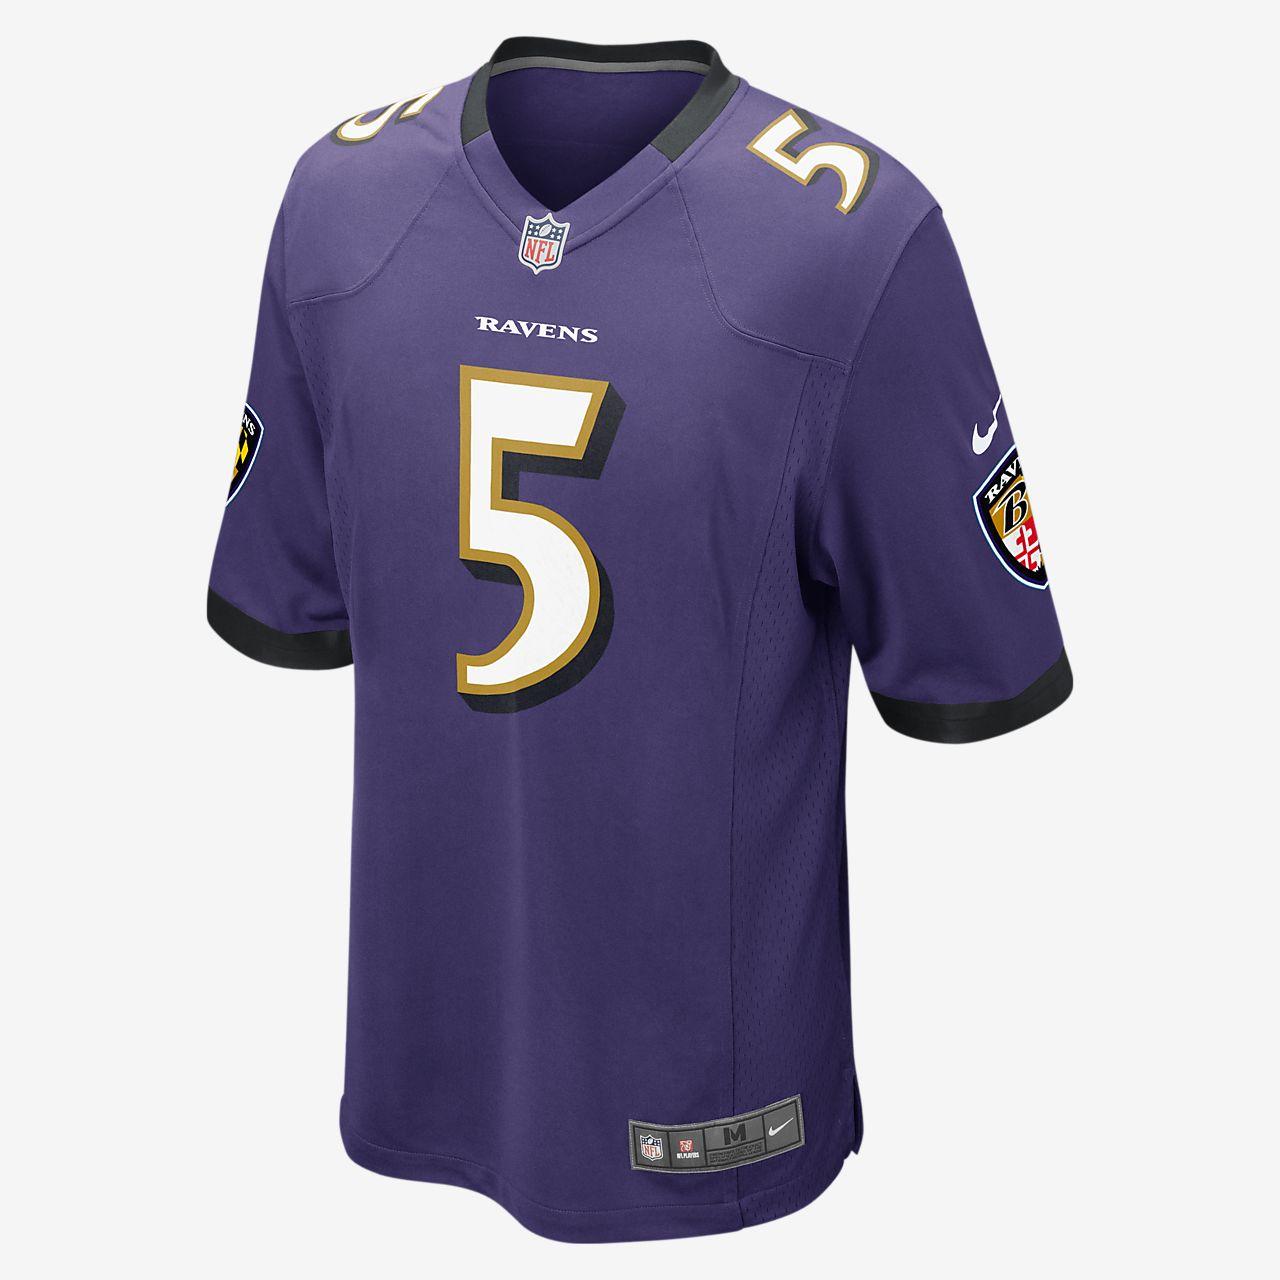 Camiseta oficial de fútbol americano para hombre NFL Baltimore Ravens (Joe Flacco) de local